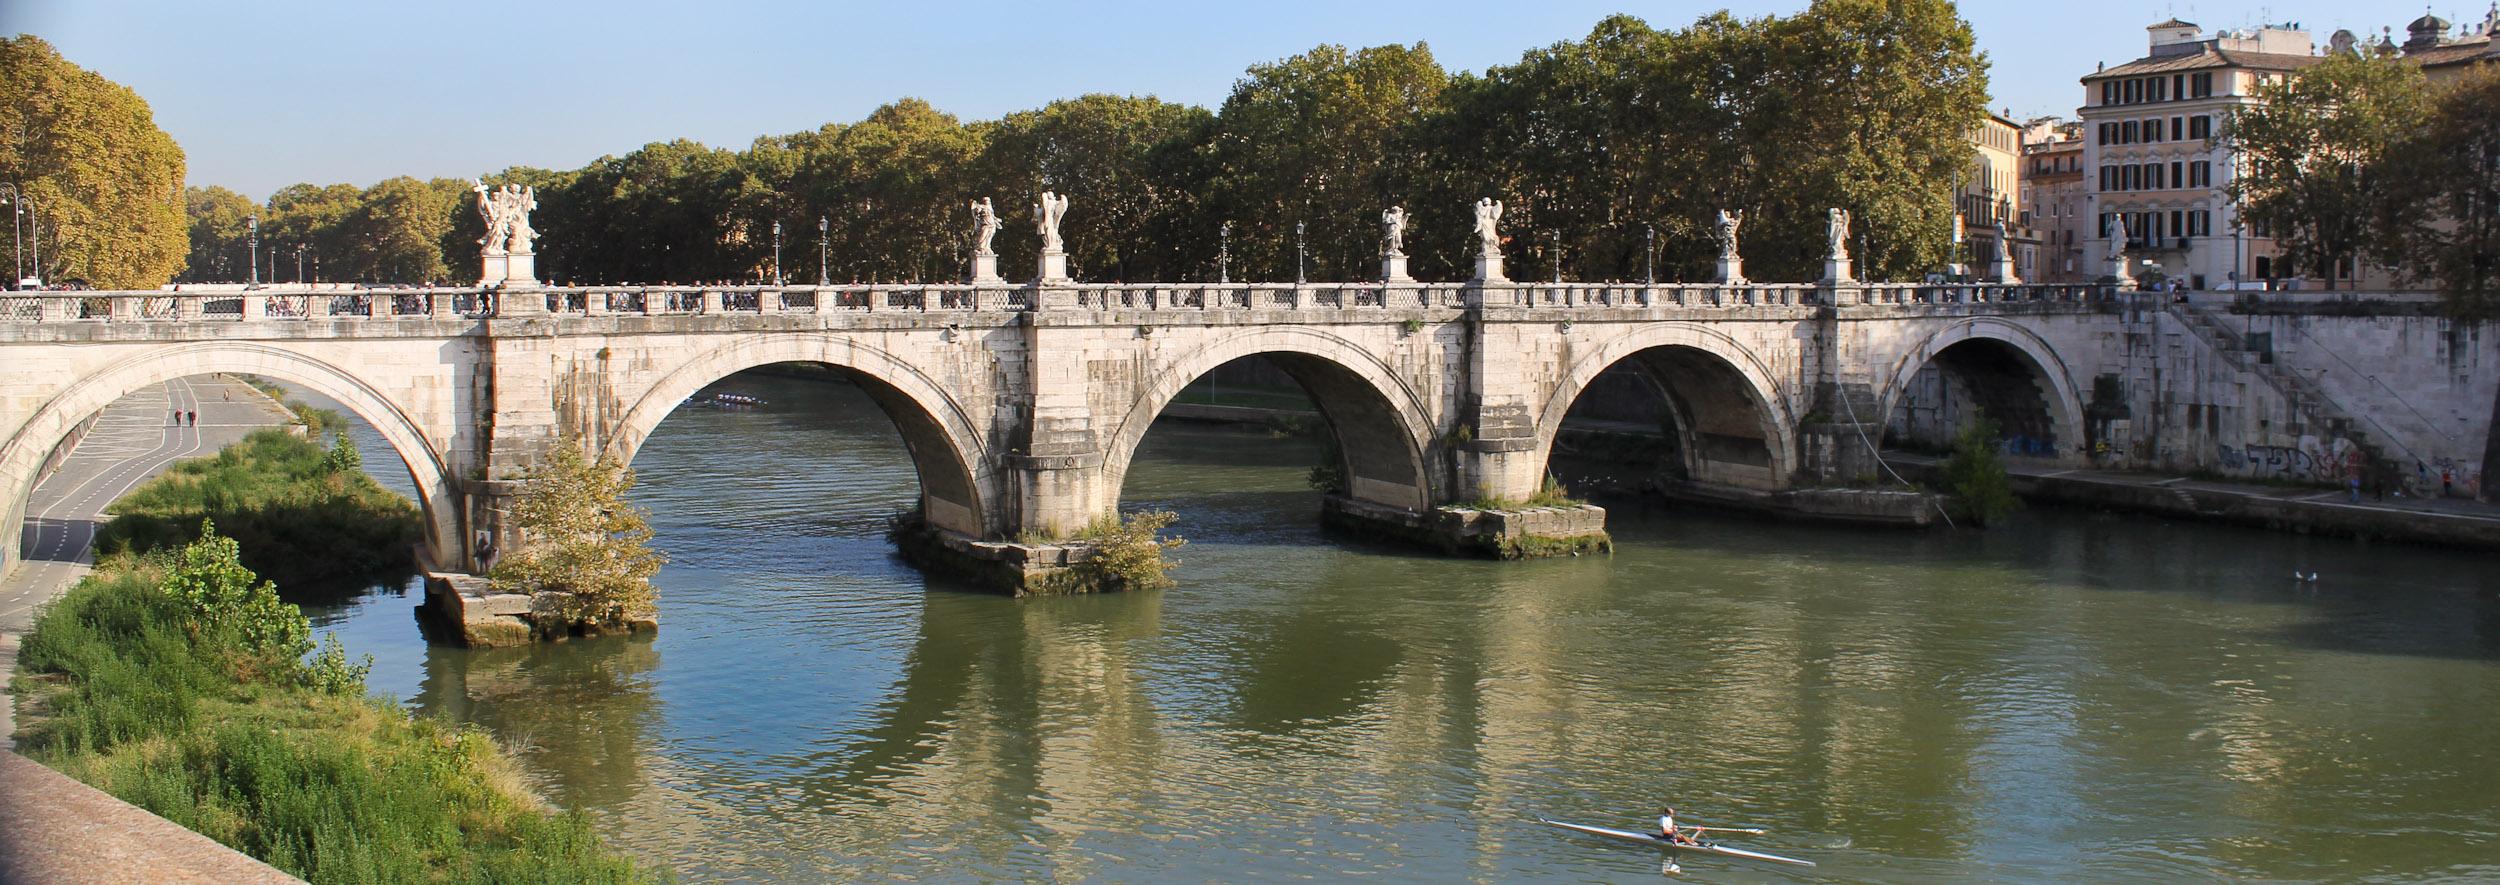 bridges in Rome - Ponte Sant Angelo